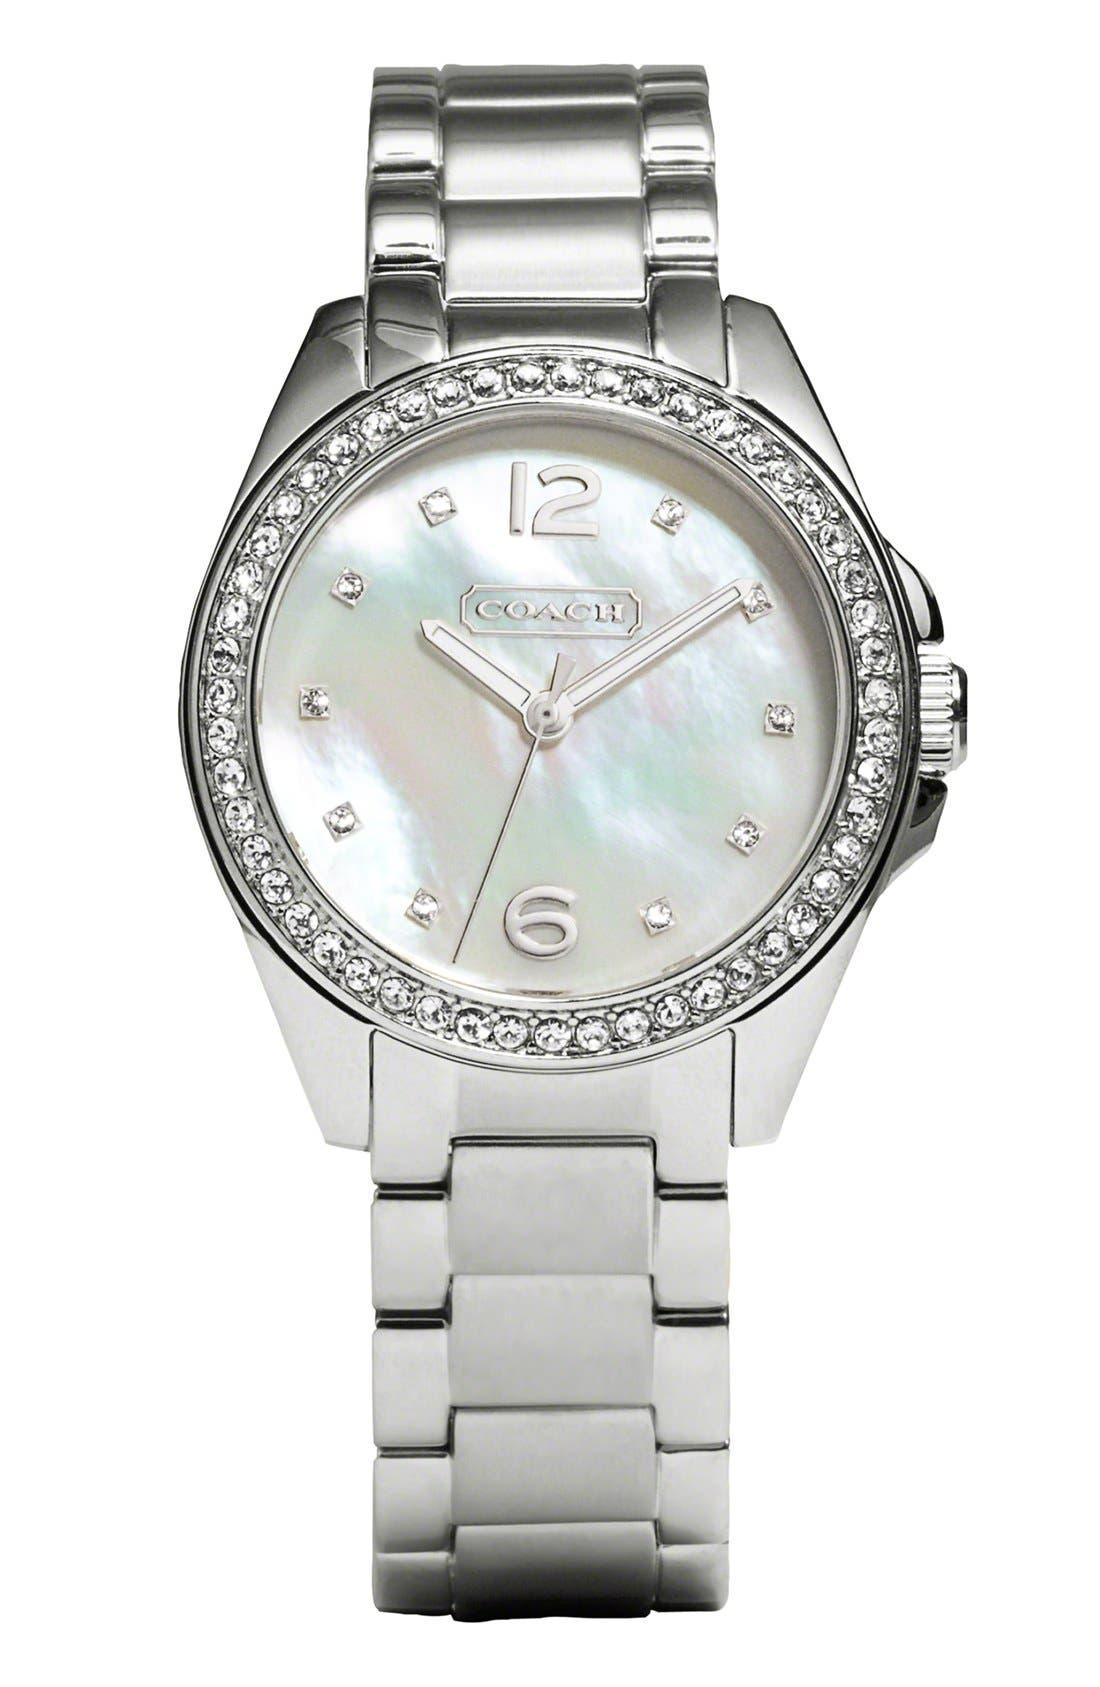 Main Image - COACH 'Tristen' Crystal Bezel Bracelet Watch, 32mm